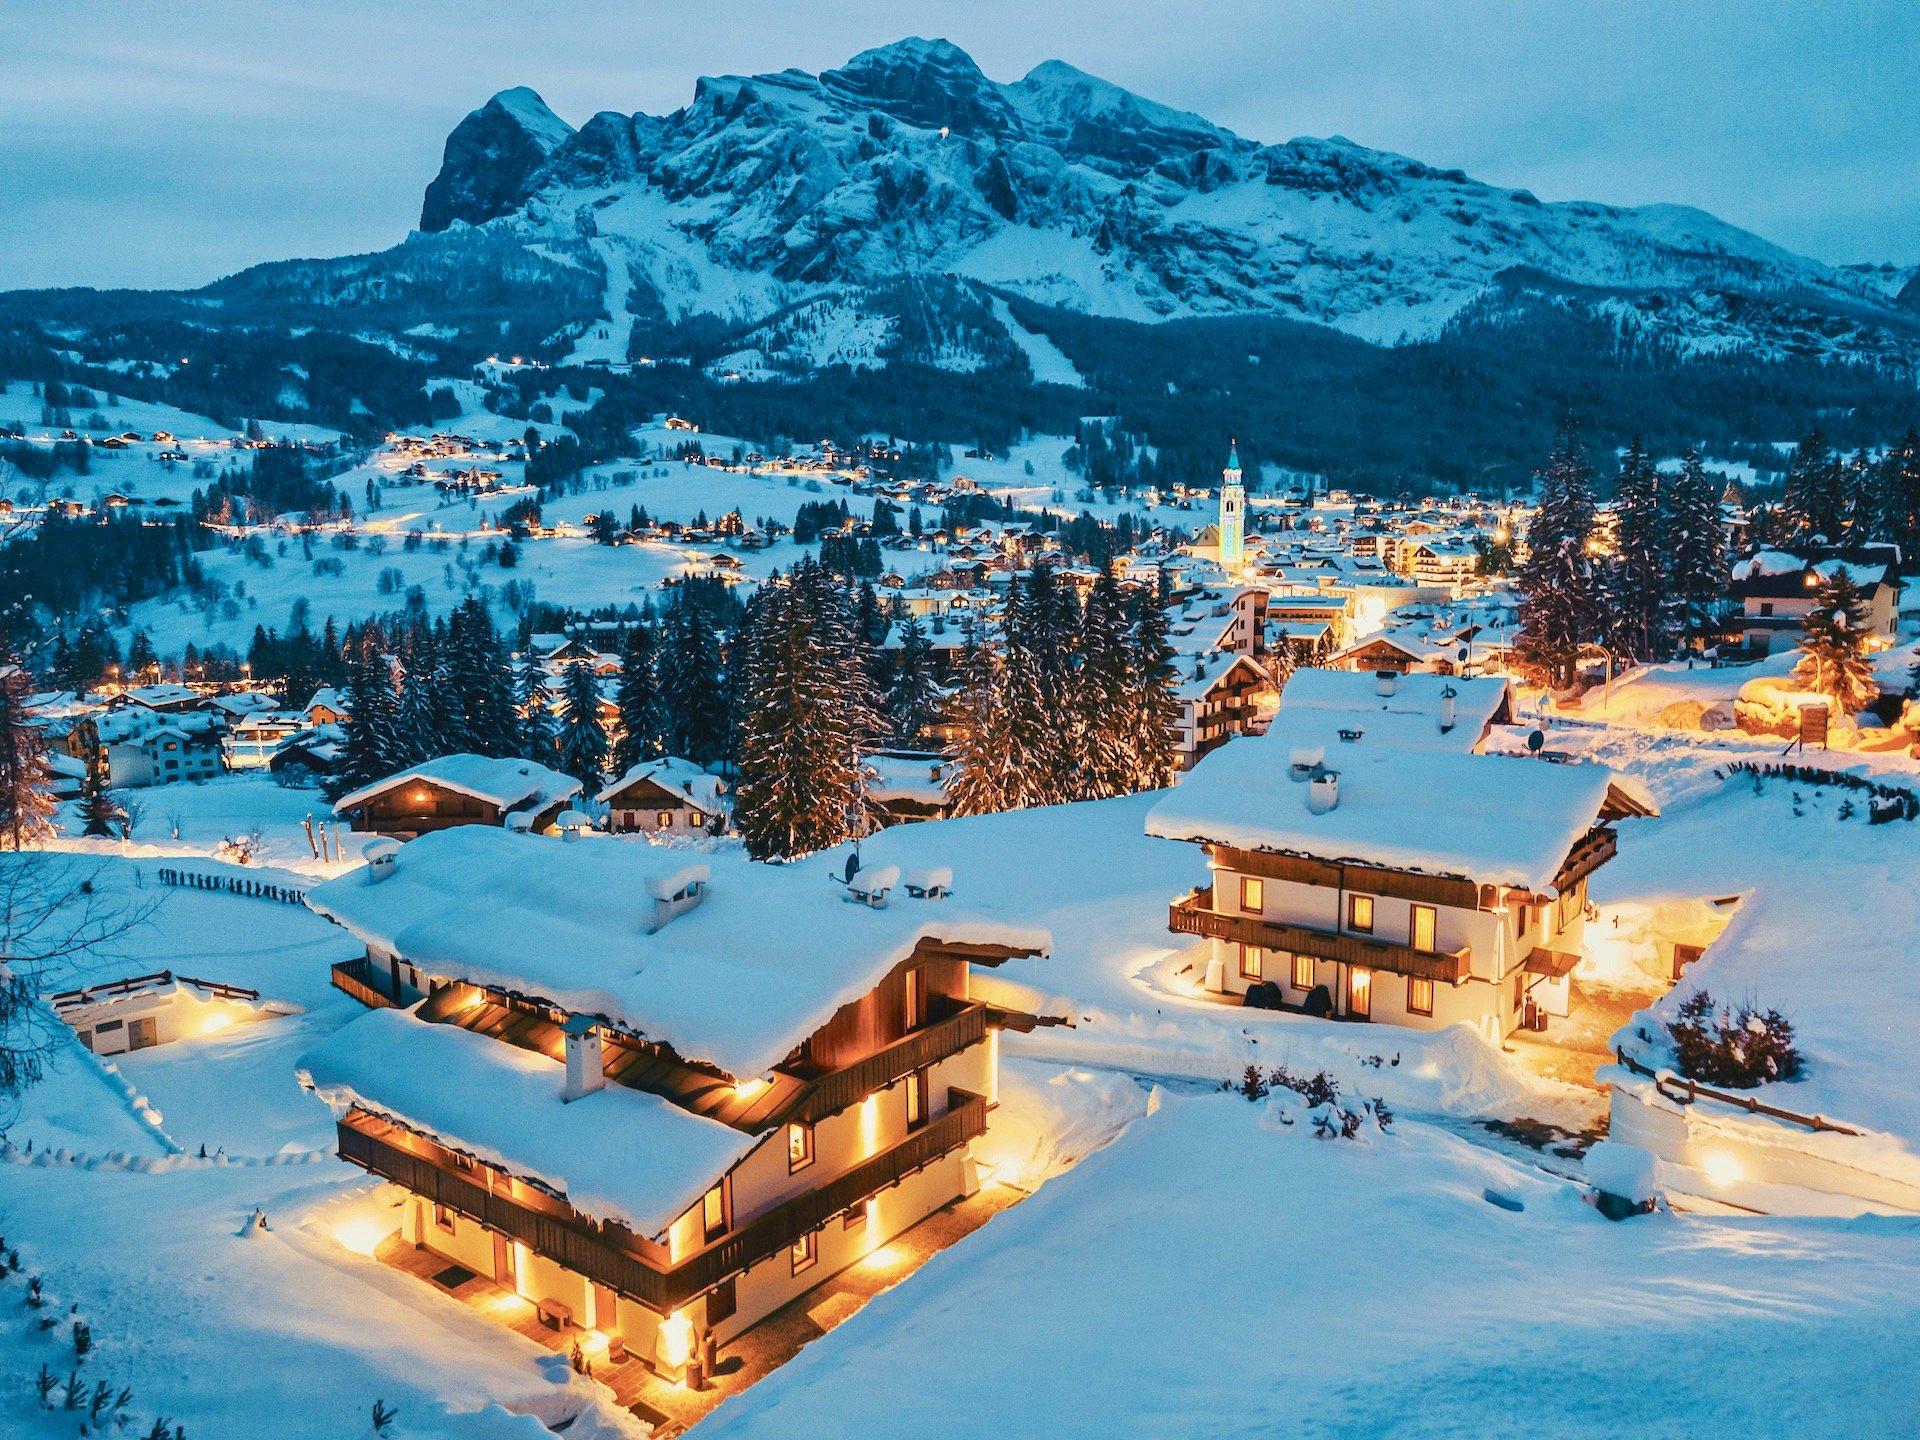 Chalet & Cortina Night View